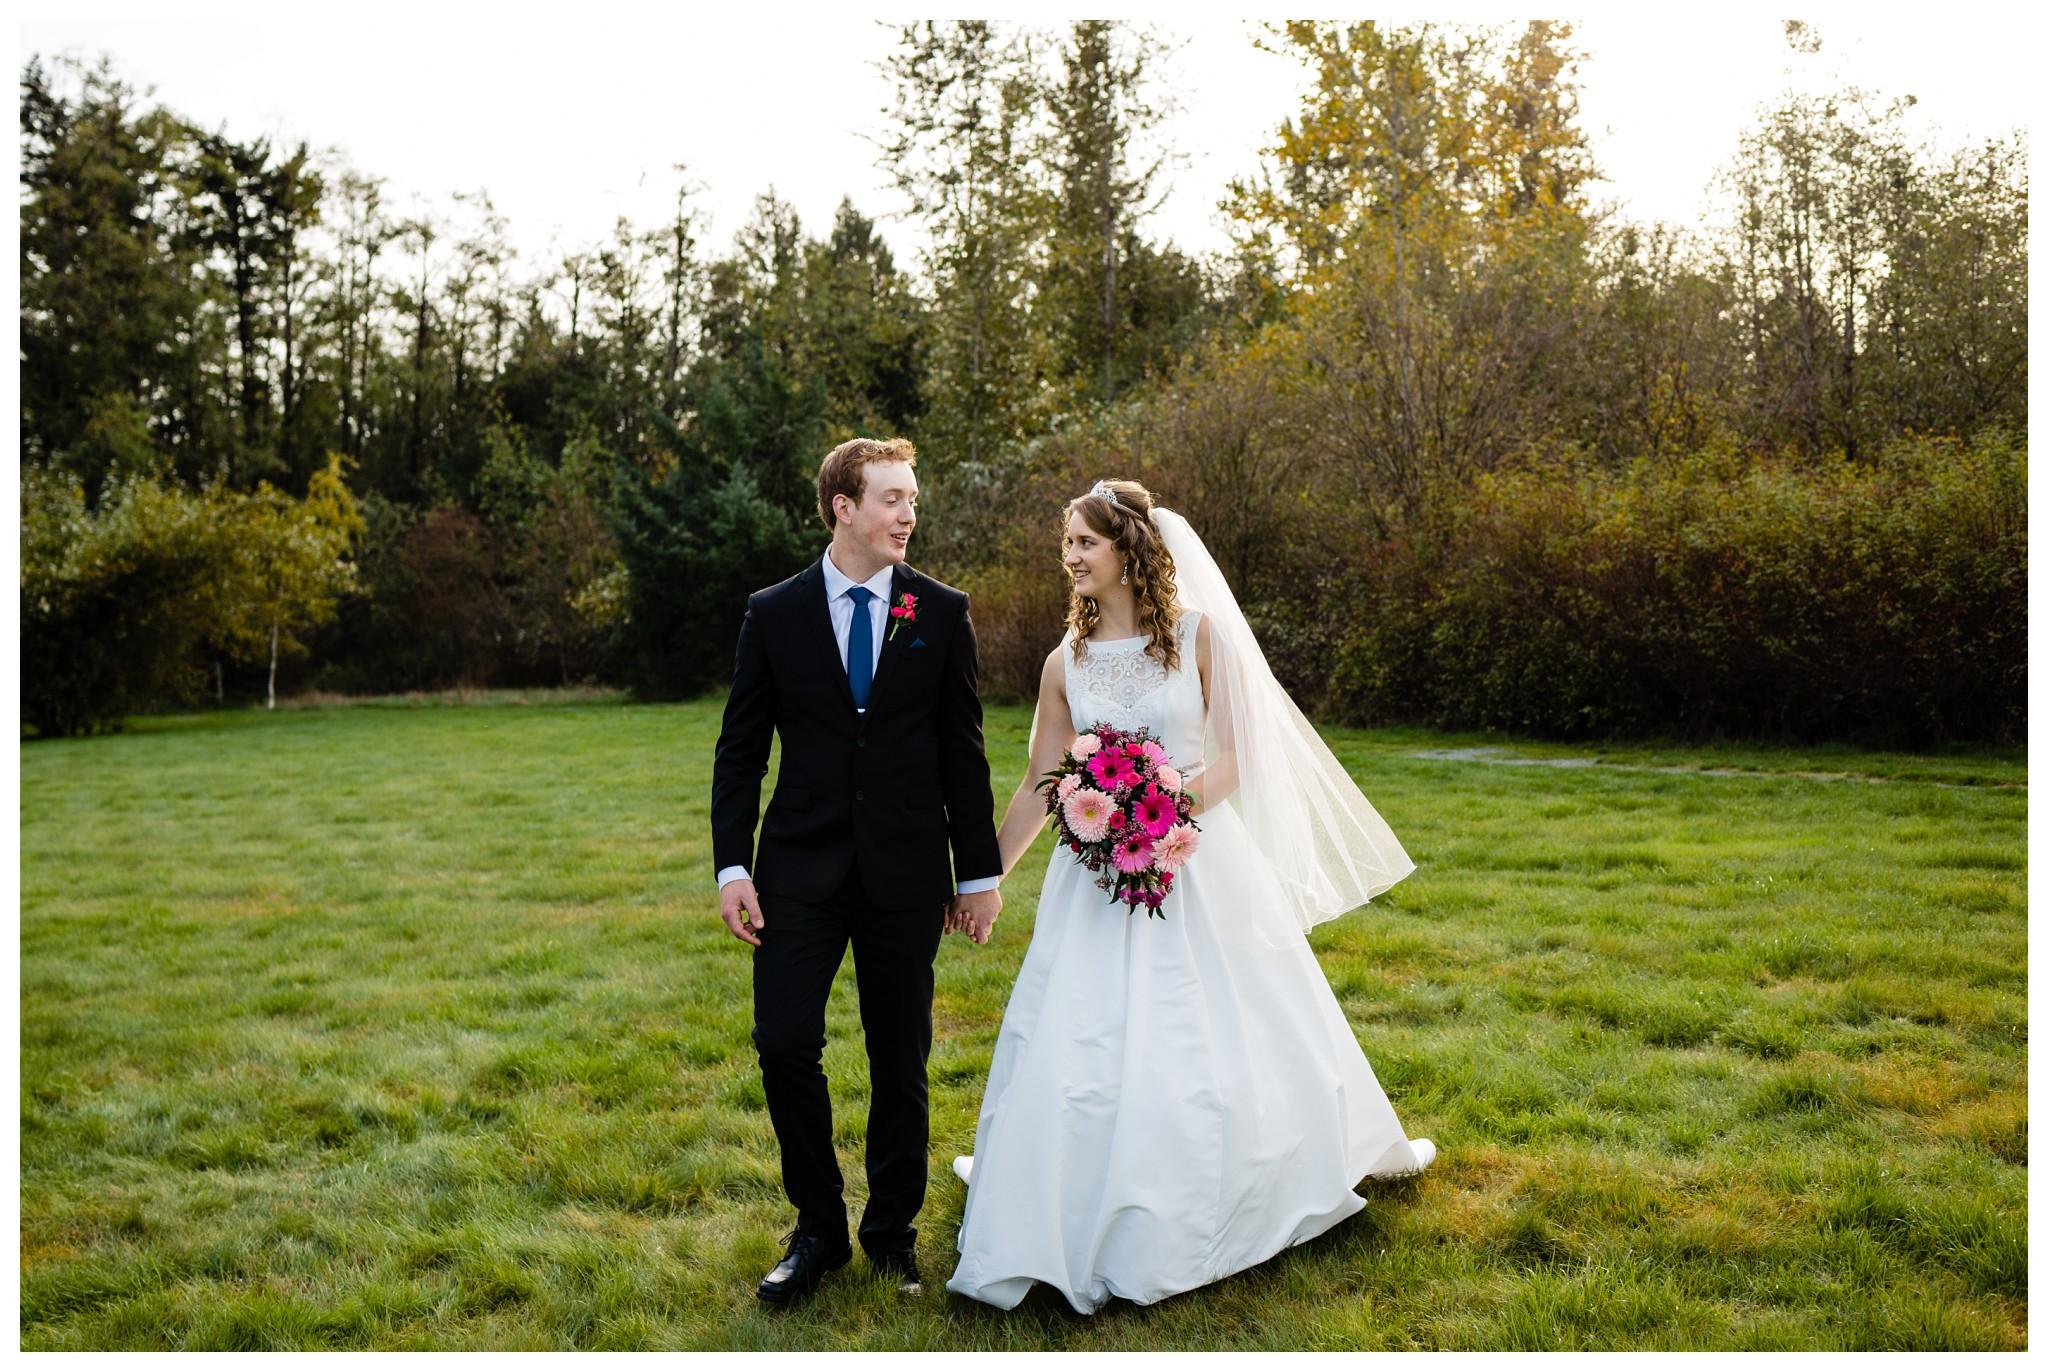 Aldergrove Park Christian Church Wedding Photography Pink Flowers Blue Bridesmaid Dress Fall_0108.jpg